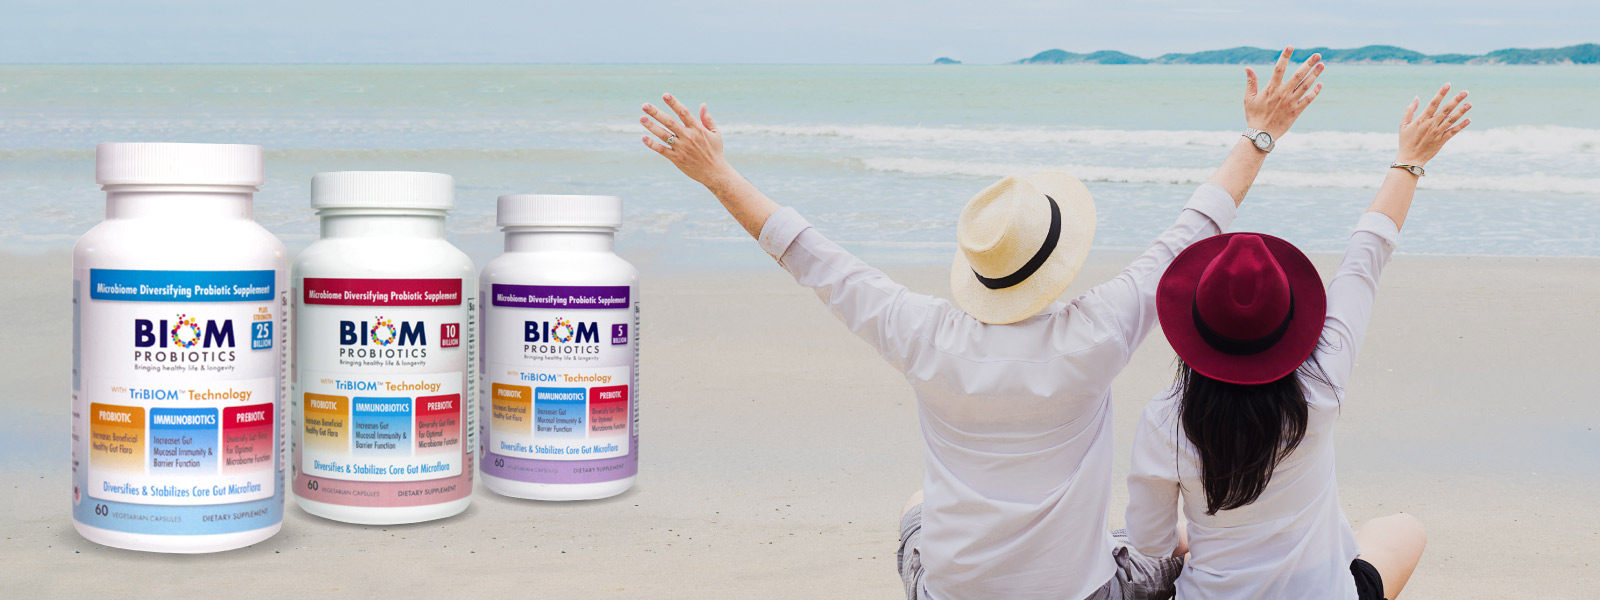 Gut Microbiome Human Health Probiotics   Biom Probiotics   Probiotics